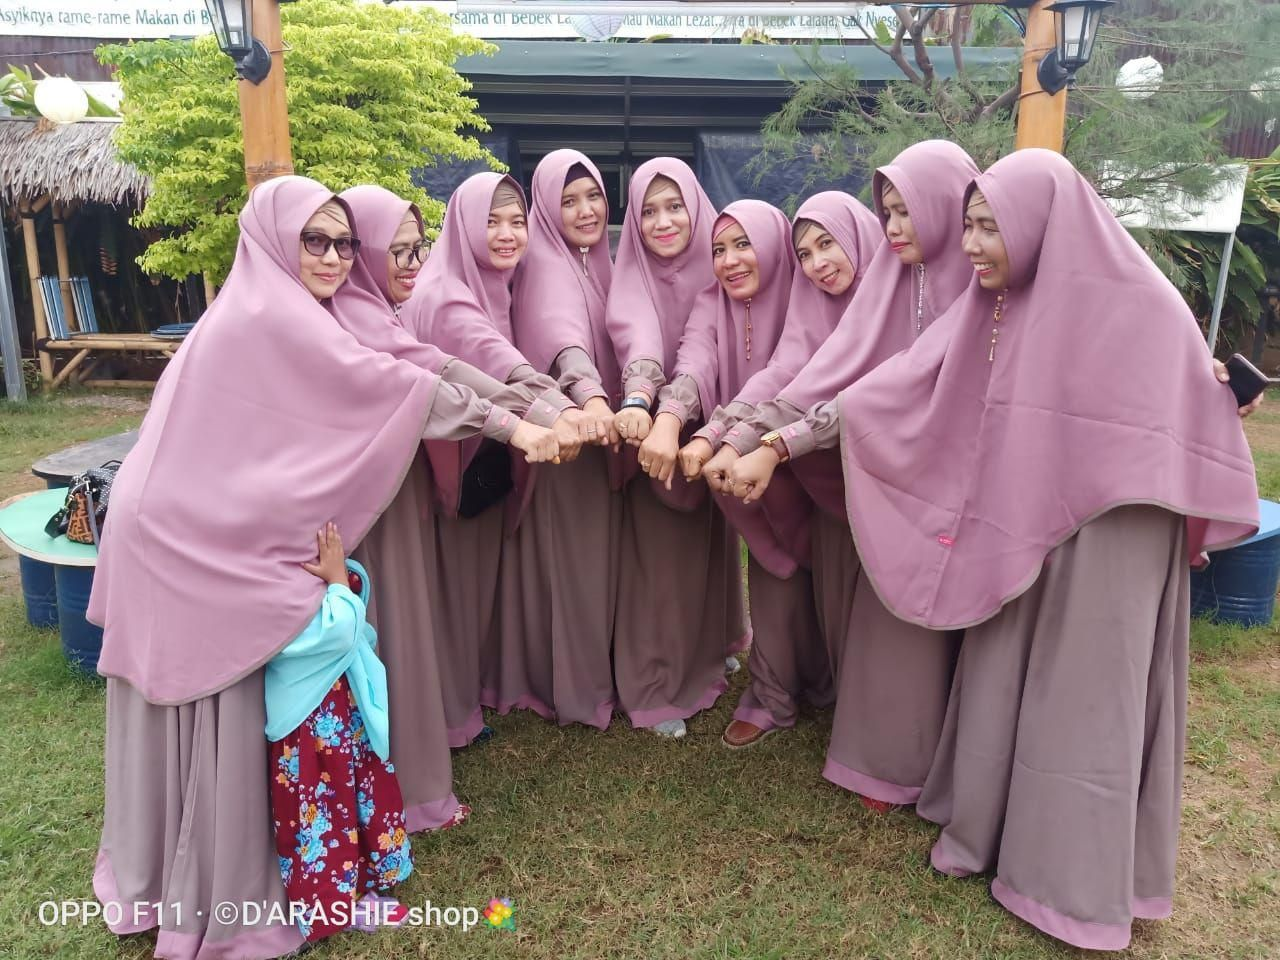 Baju Coklat Susu Jilbab Warna Apa